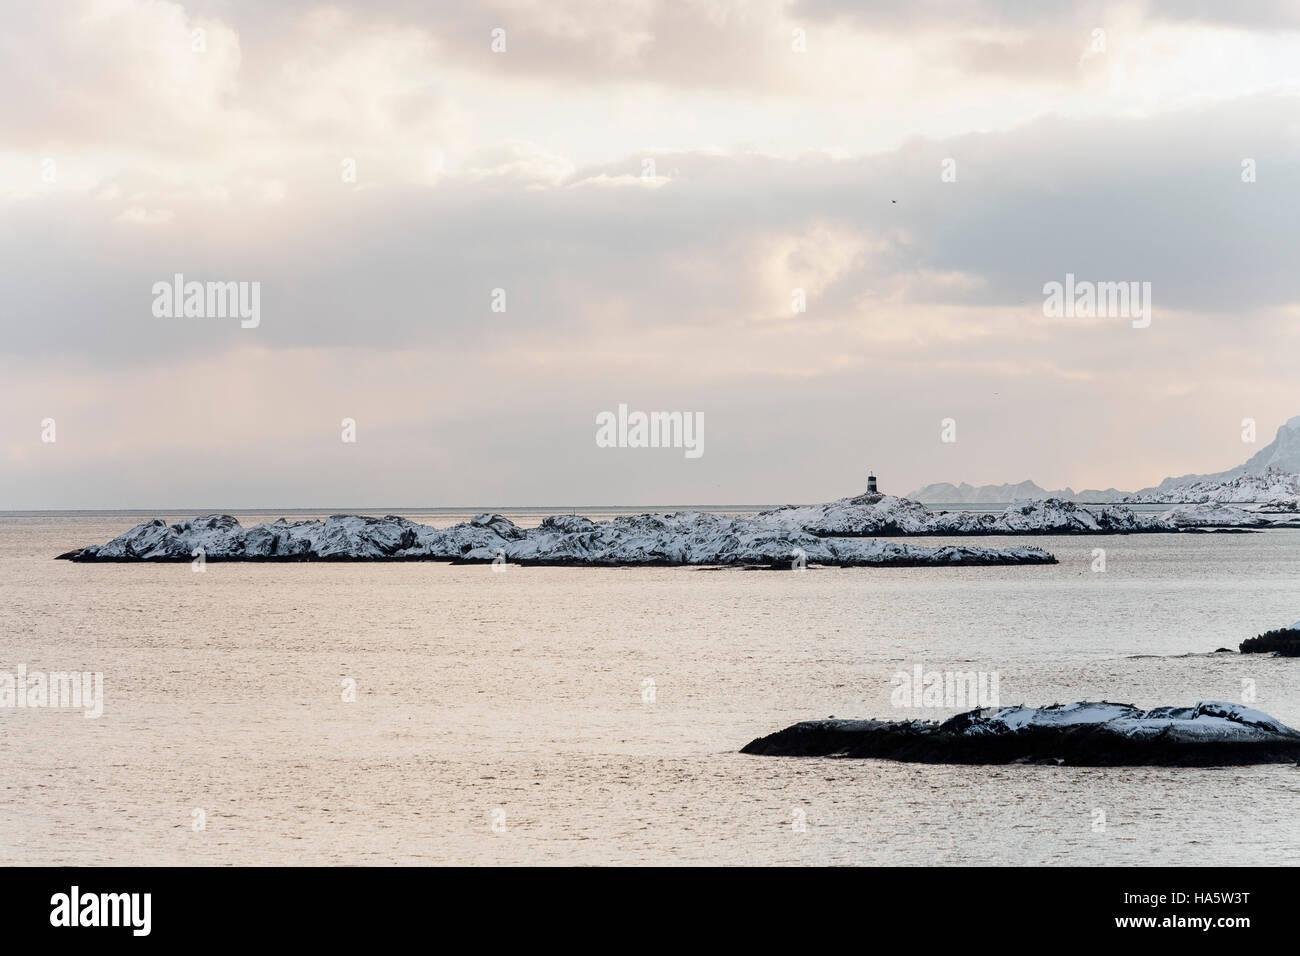 Coastal landscape at Lofoten, Norway - Stock Image